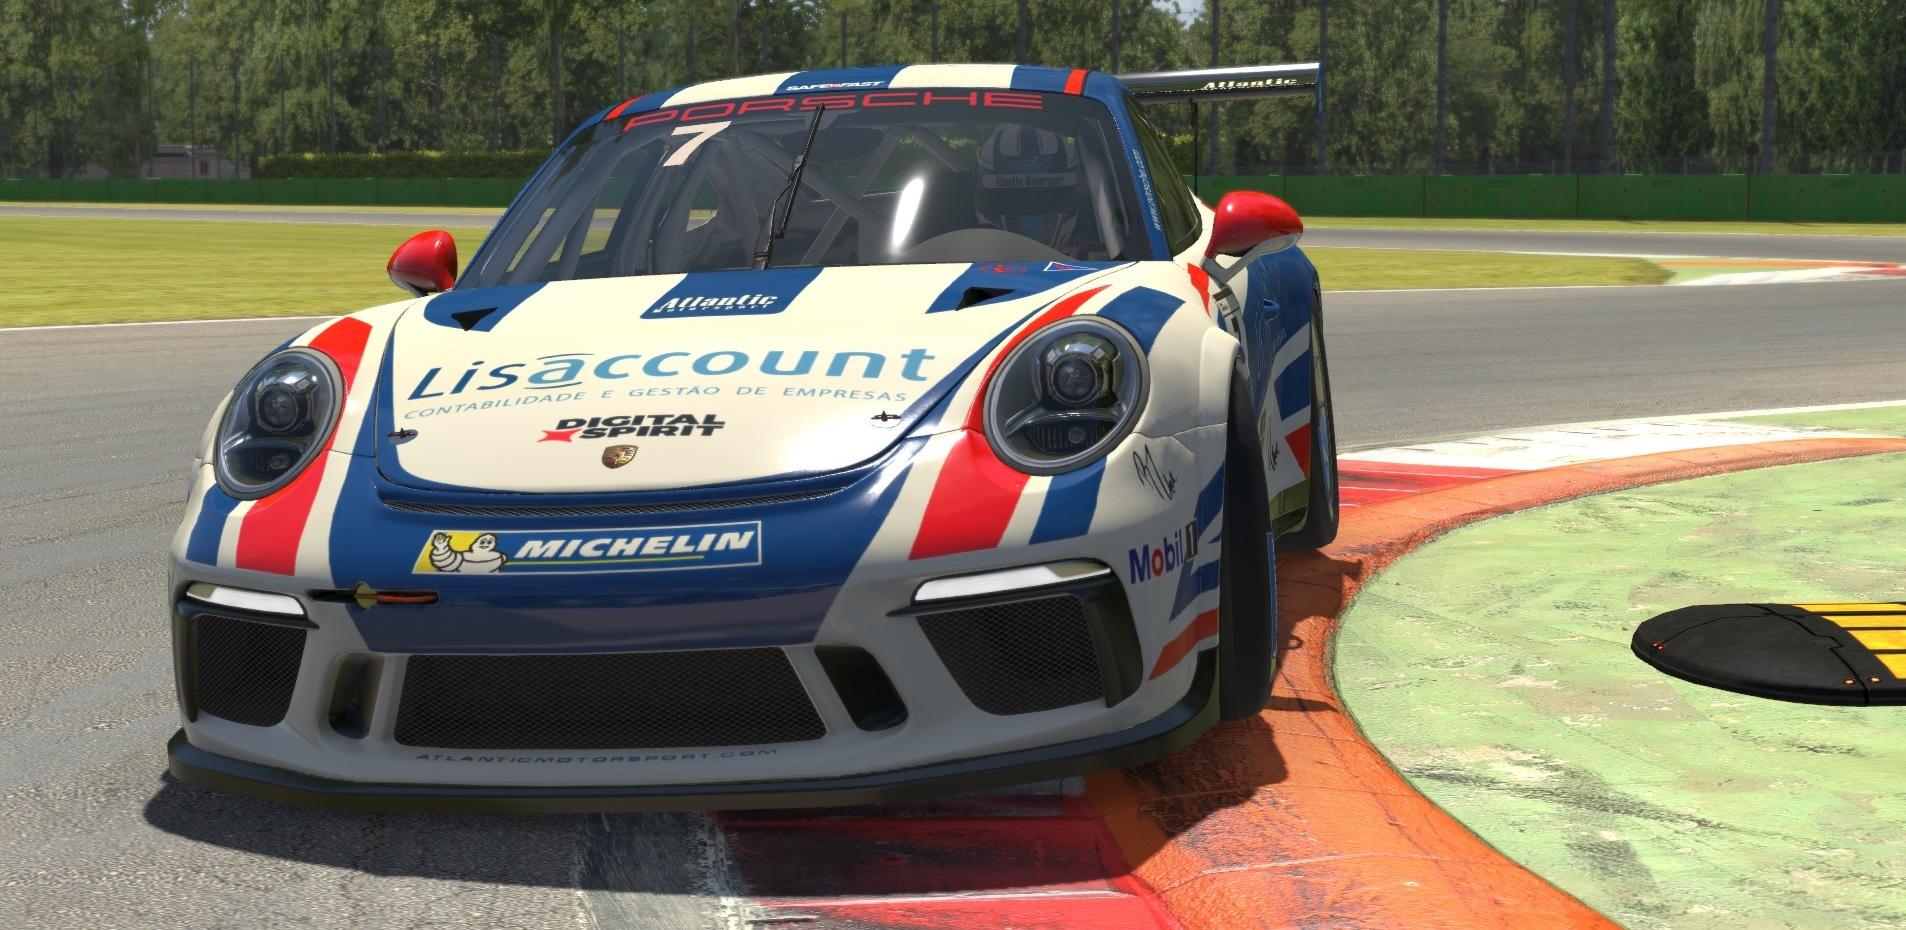 Atlantic Motorsport presents the new Porsche 911 GT3 CUP (991) for iRacing